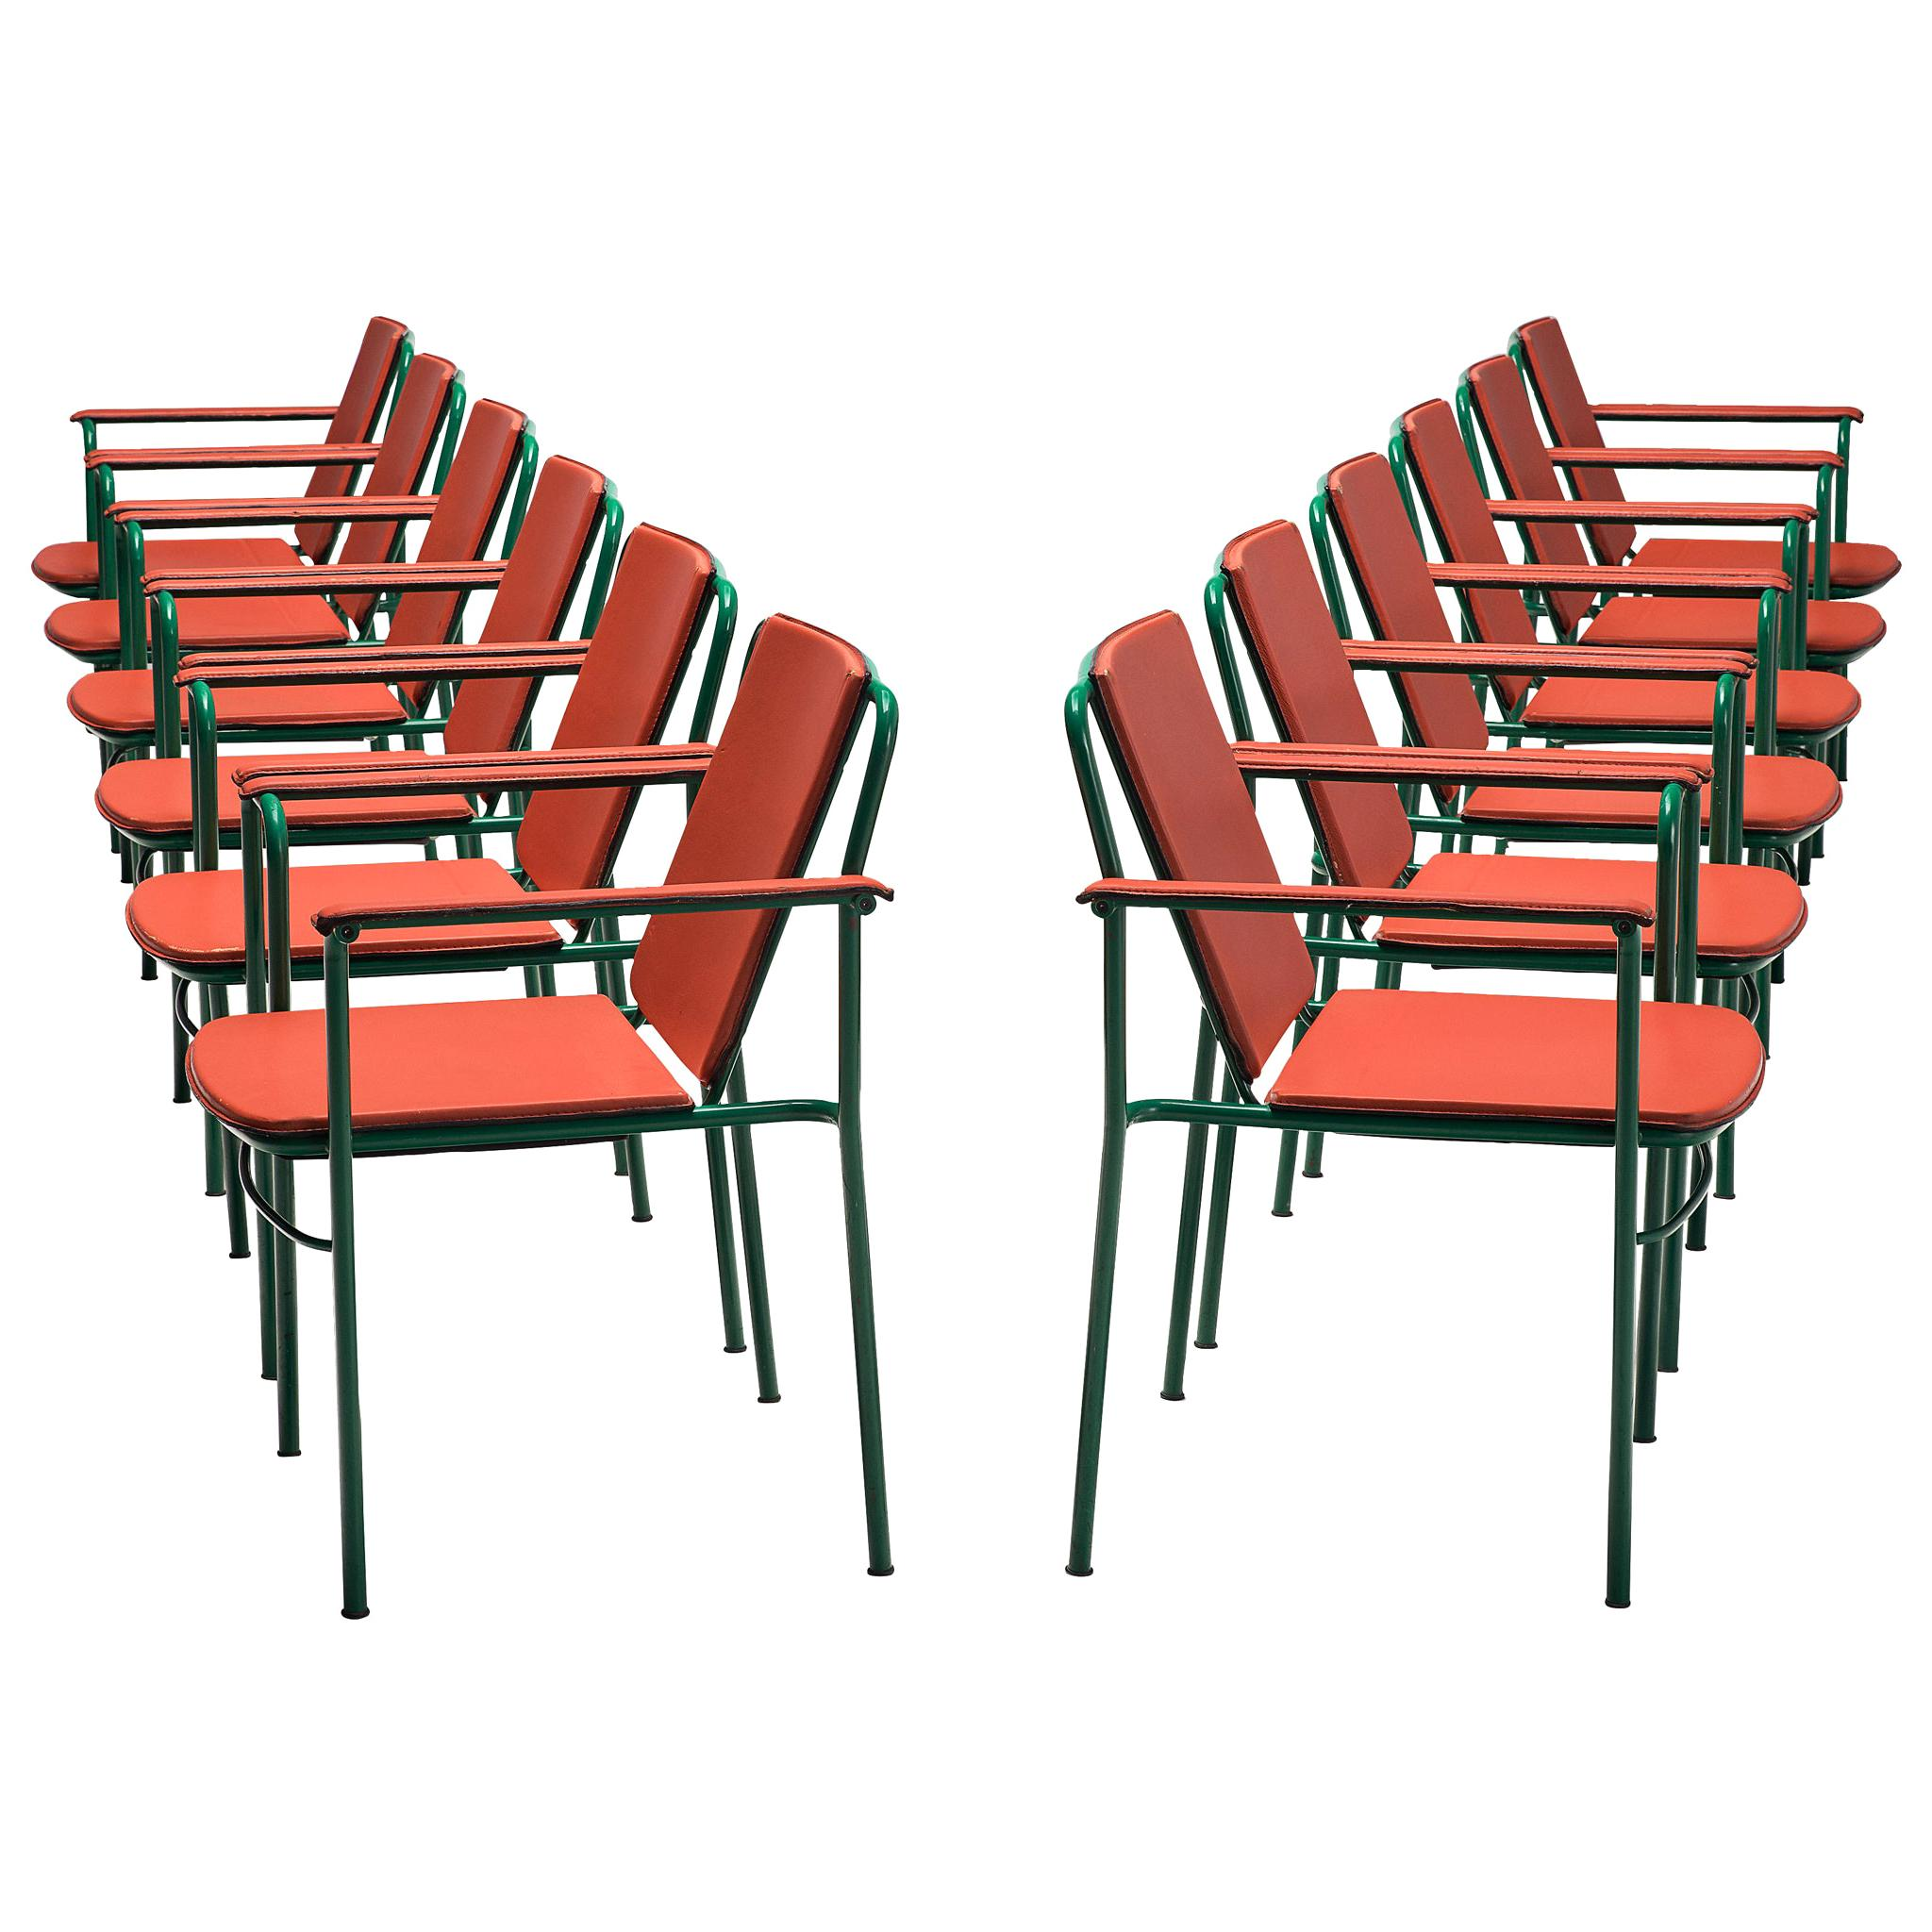 Mario Marenco for Poltrona Frau Set of 12 'Movie' Chairs